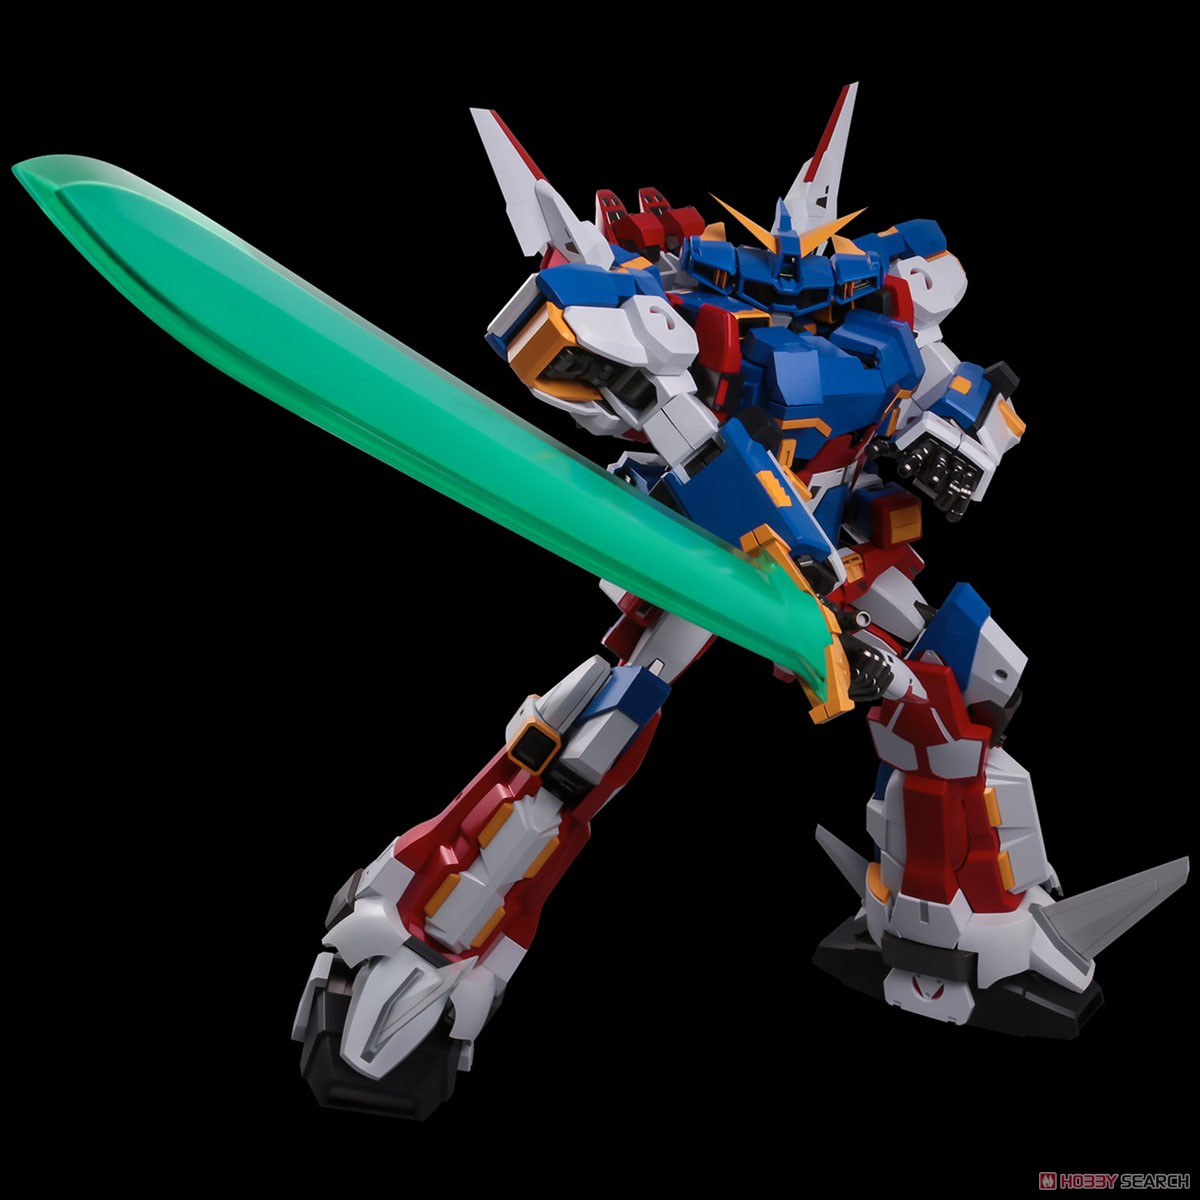 RIOBOT『変形合体 R-1』スーパーロボット大戦OG 可変合体フィギュア-052